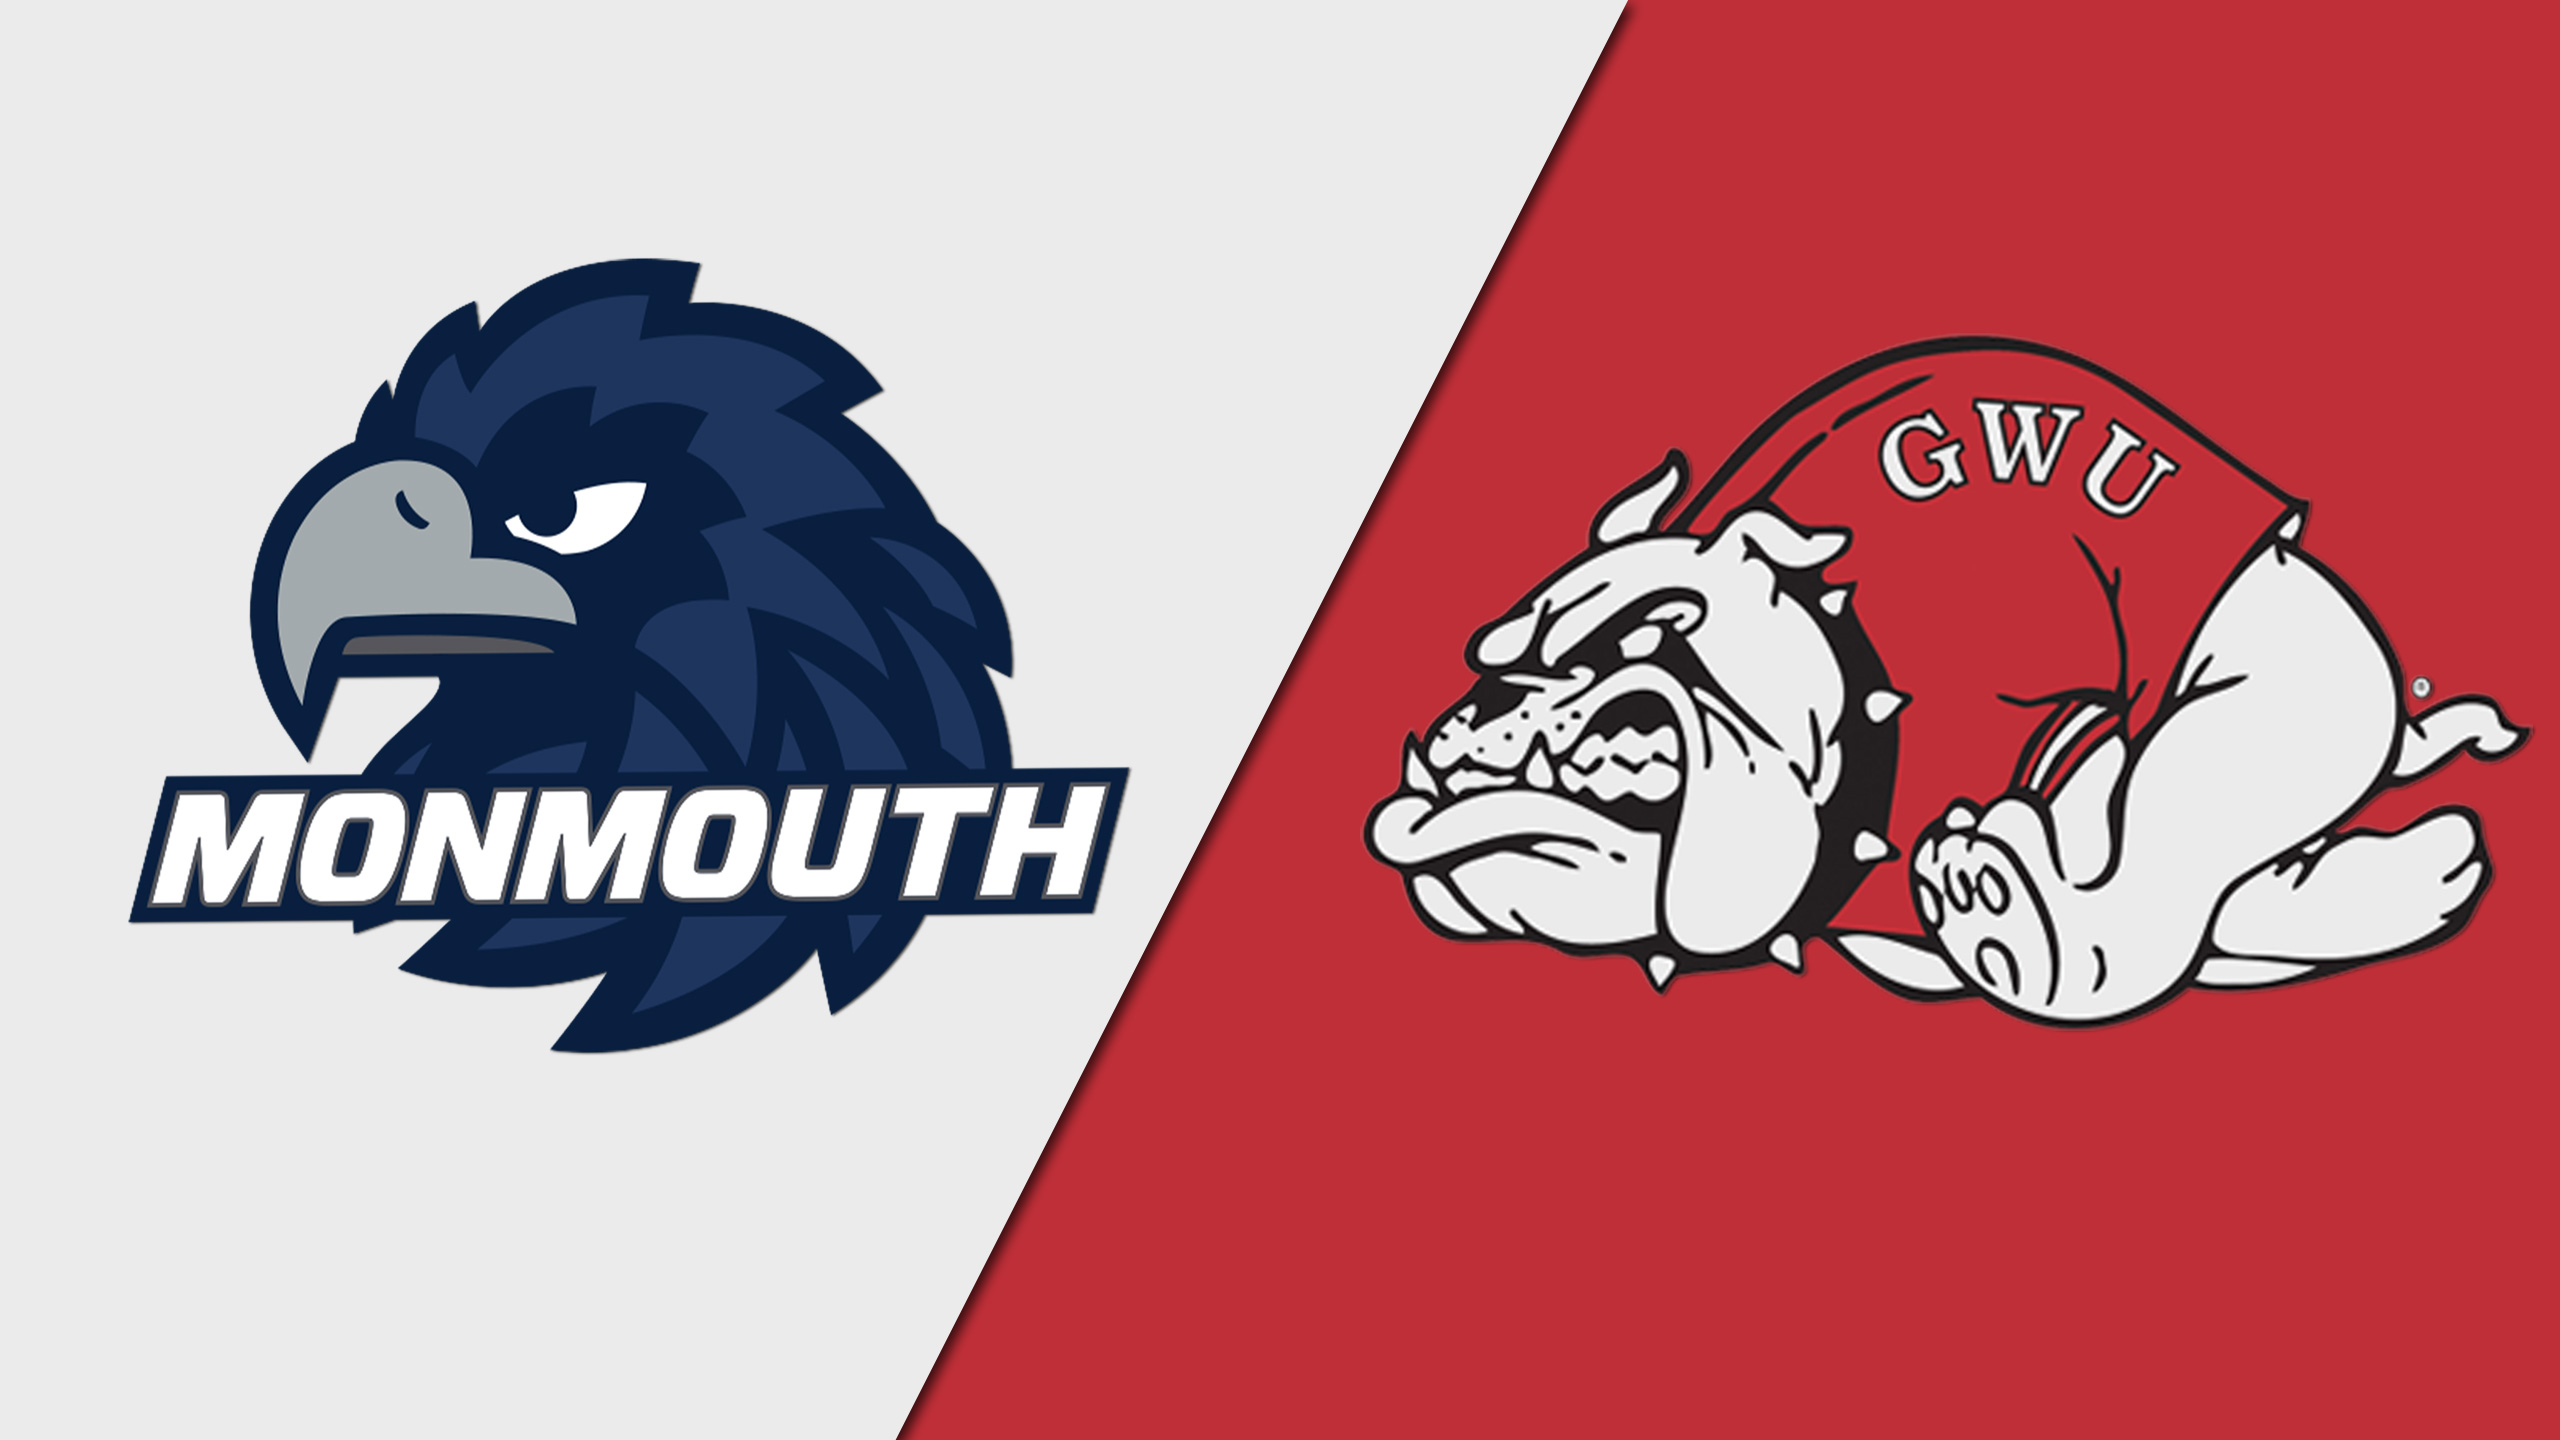 Monmouth vs. Gardner-Webb (Football)